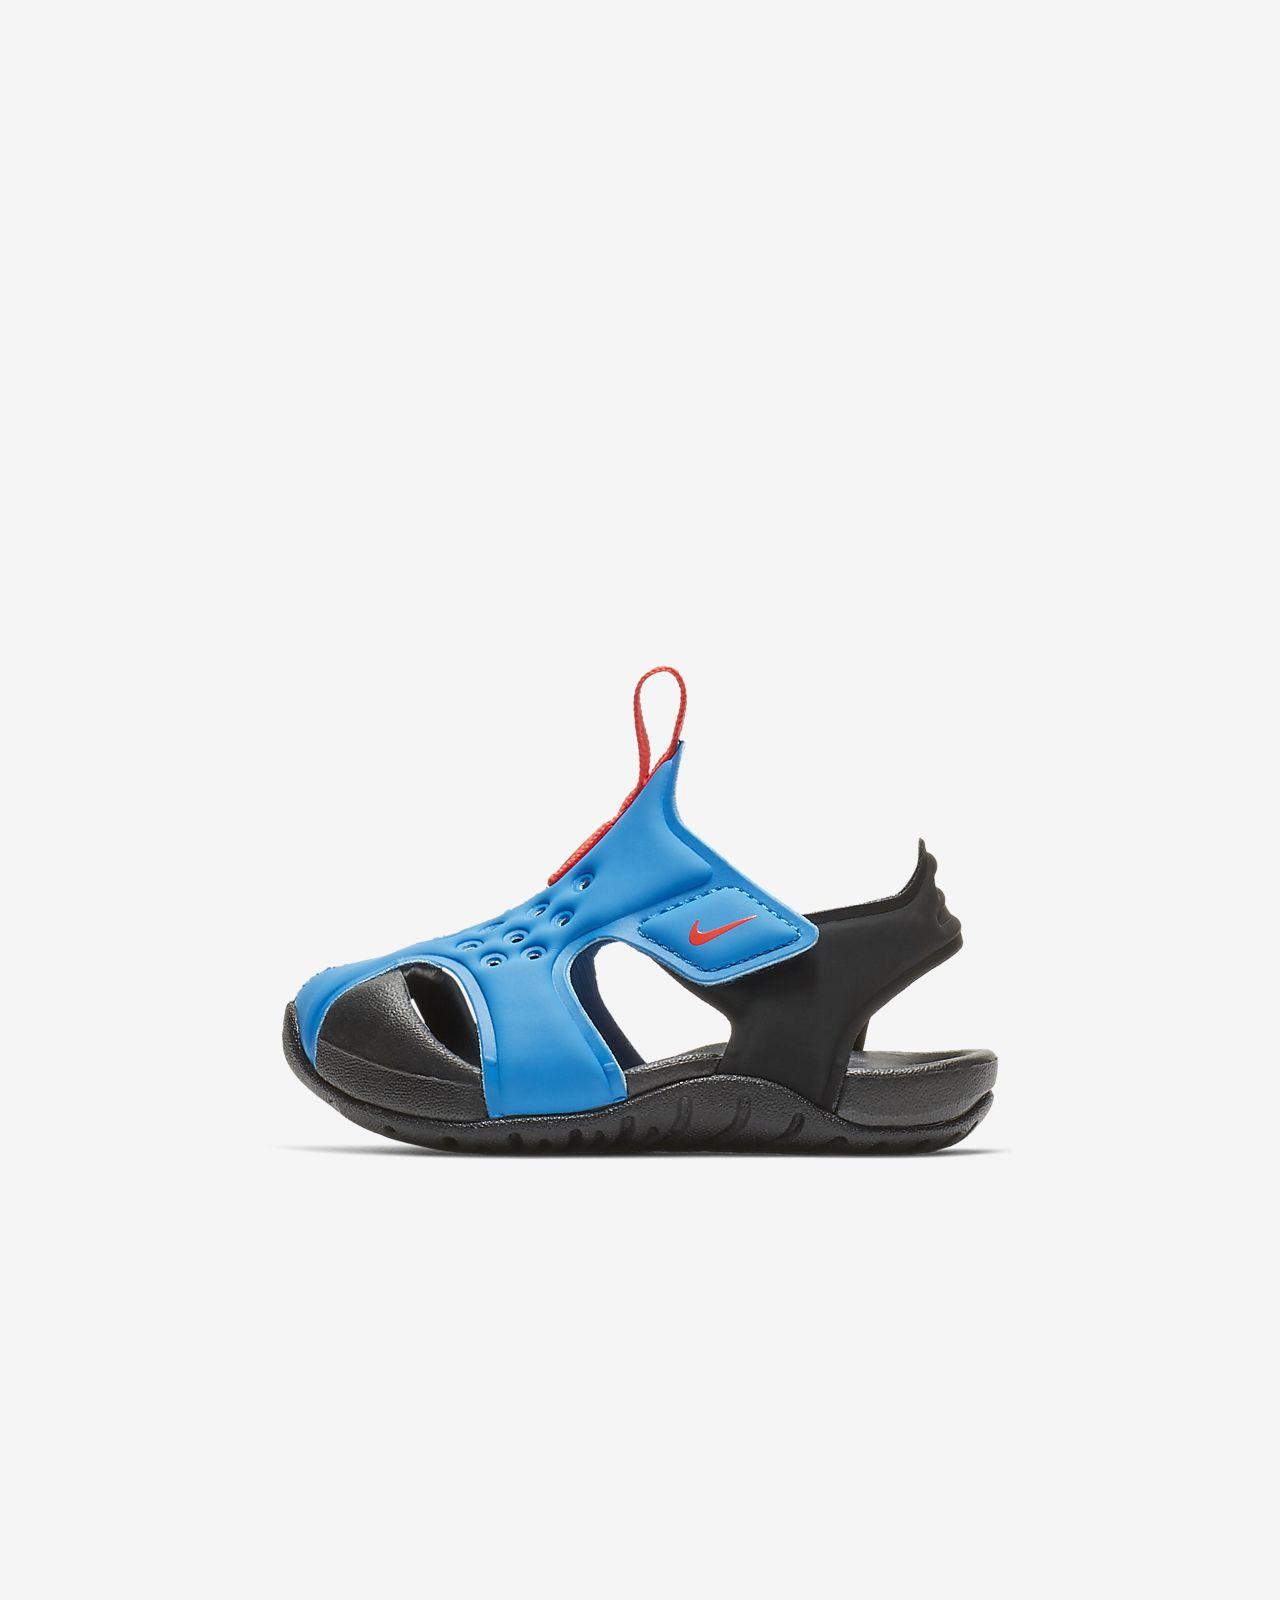 chaussure nike enfant garçon 40